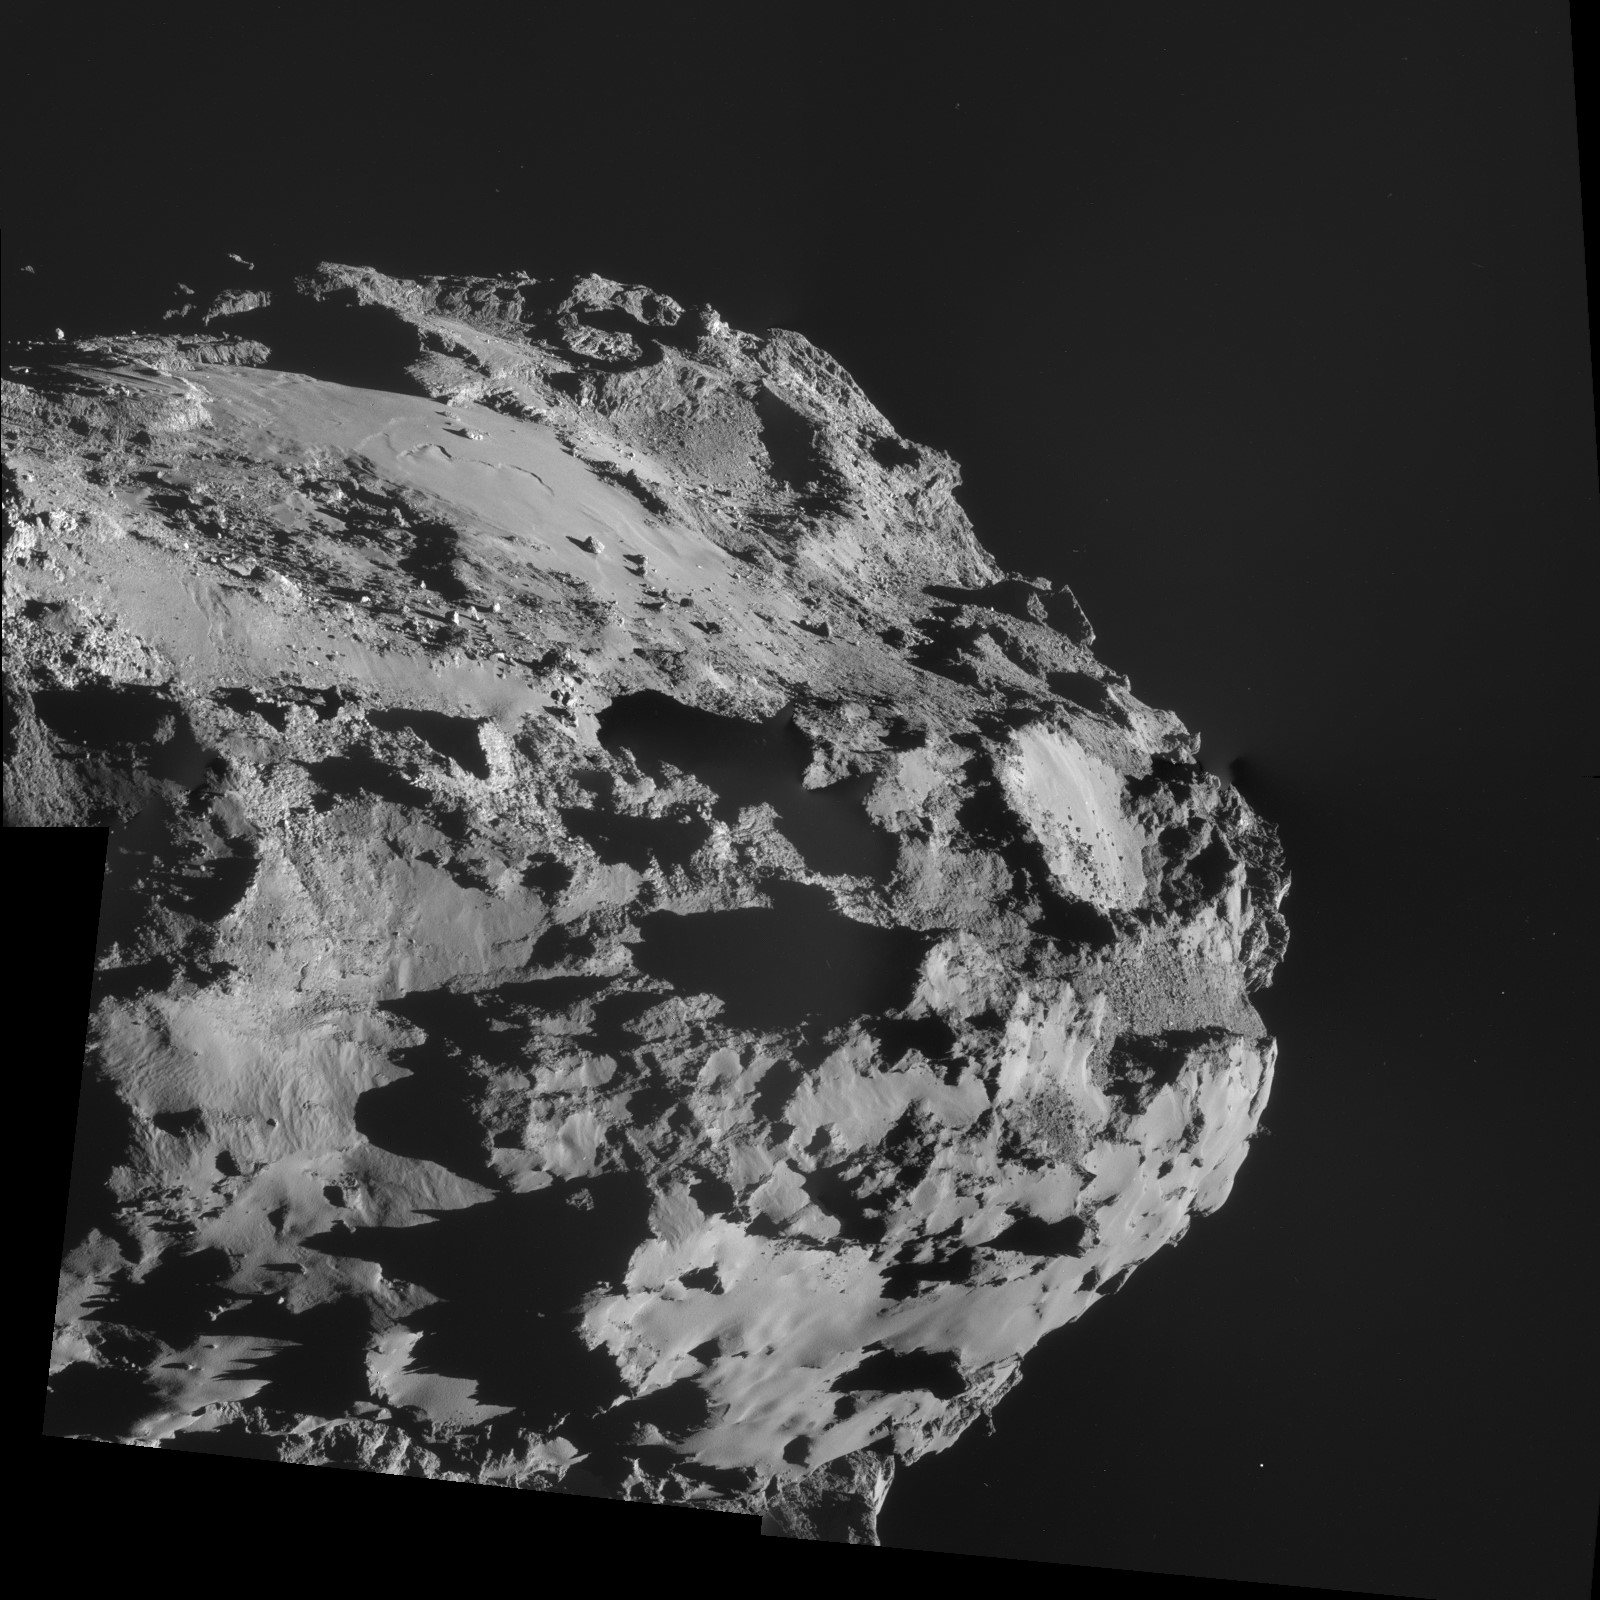 ESA_Rosetta_NAVCAM_141008_A-B-C-D-(hugin-rectilinear)